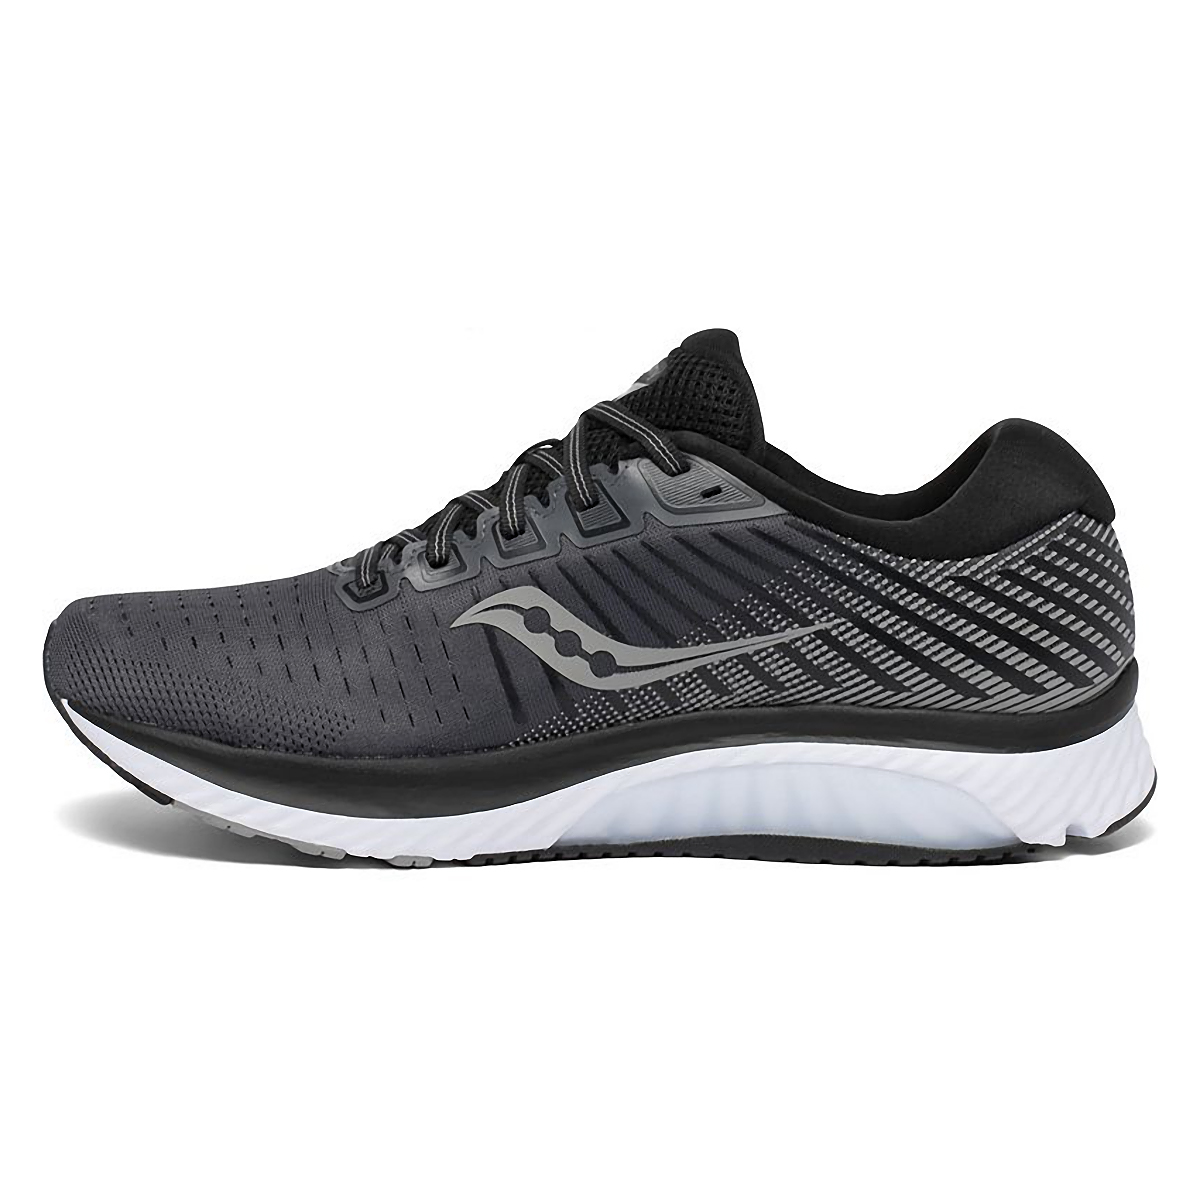 Men's Saucony Guide 13 Walking Shoe - Color: Black/White - Size: 8 - Width: Regular, Black/White, large, image 2